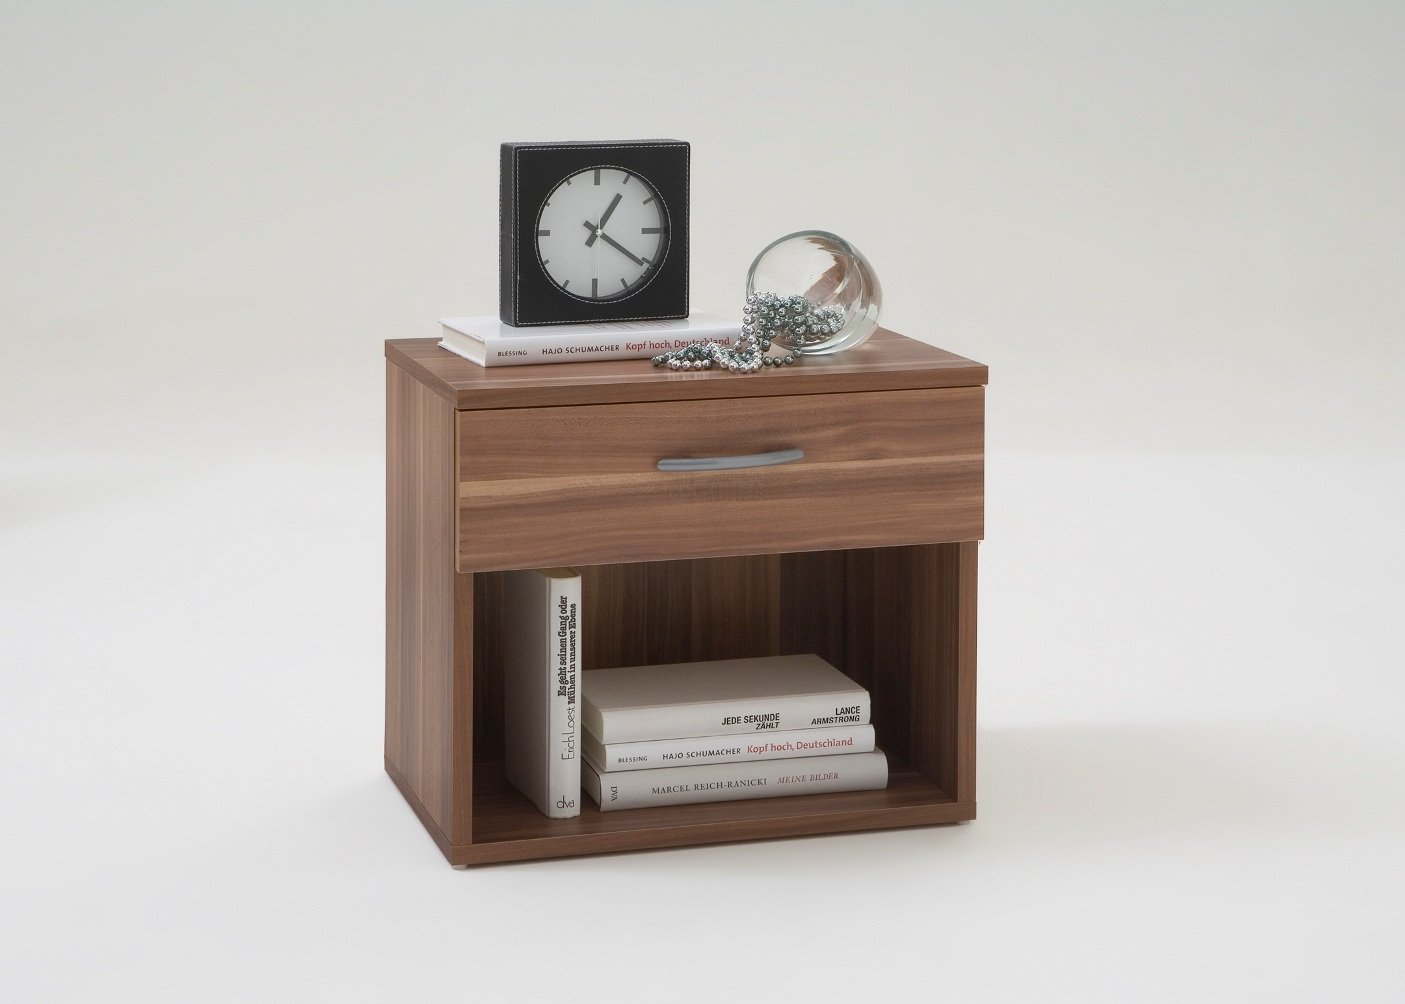 terni modern bedside cabinet coffee side table in walnut colour by  - terni modern bedside cabinet coffee side table in walnut colour by dmfamazoncouk kitchen  home